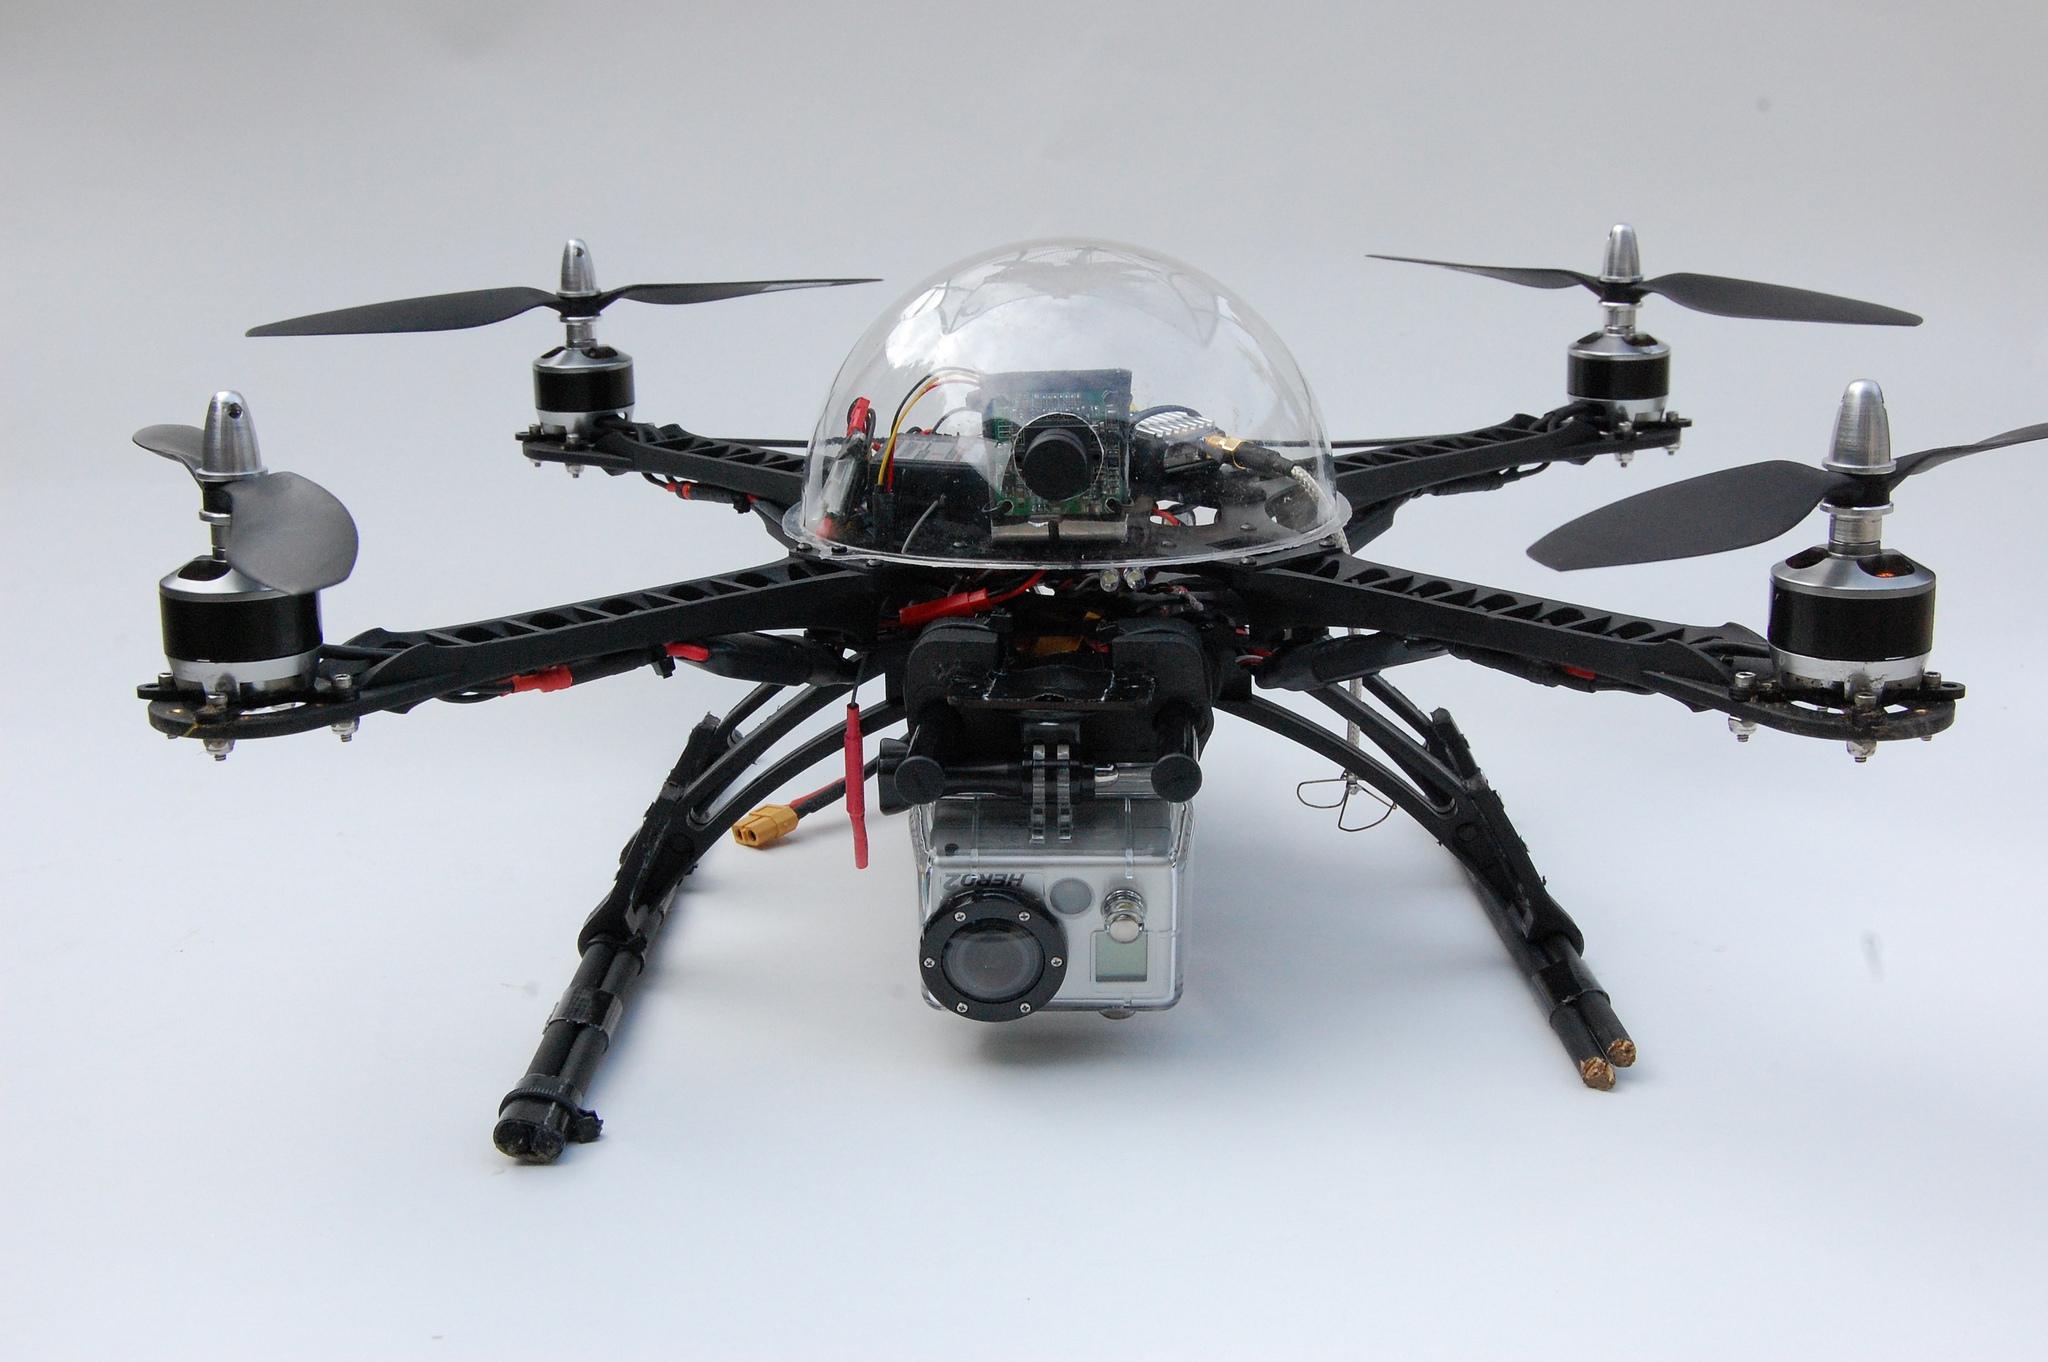 FPV quadcopter, steve lodefink May 4, 2012